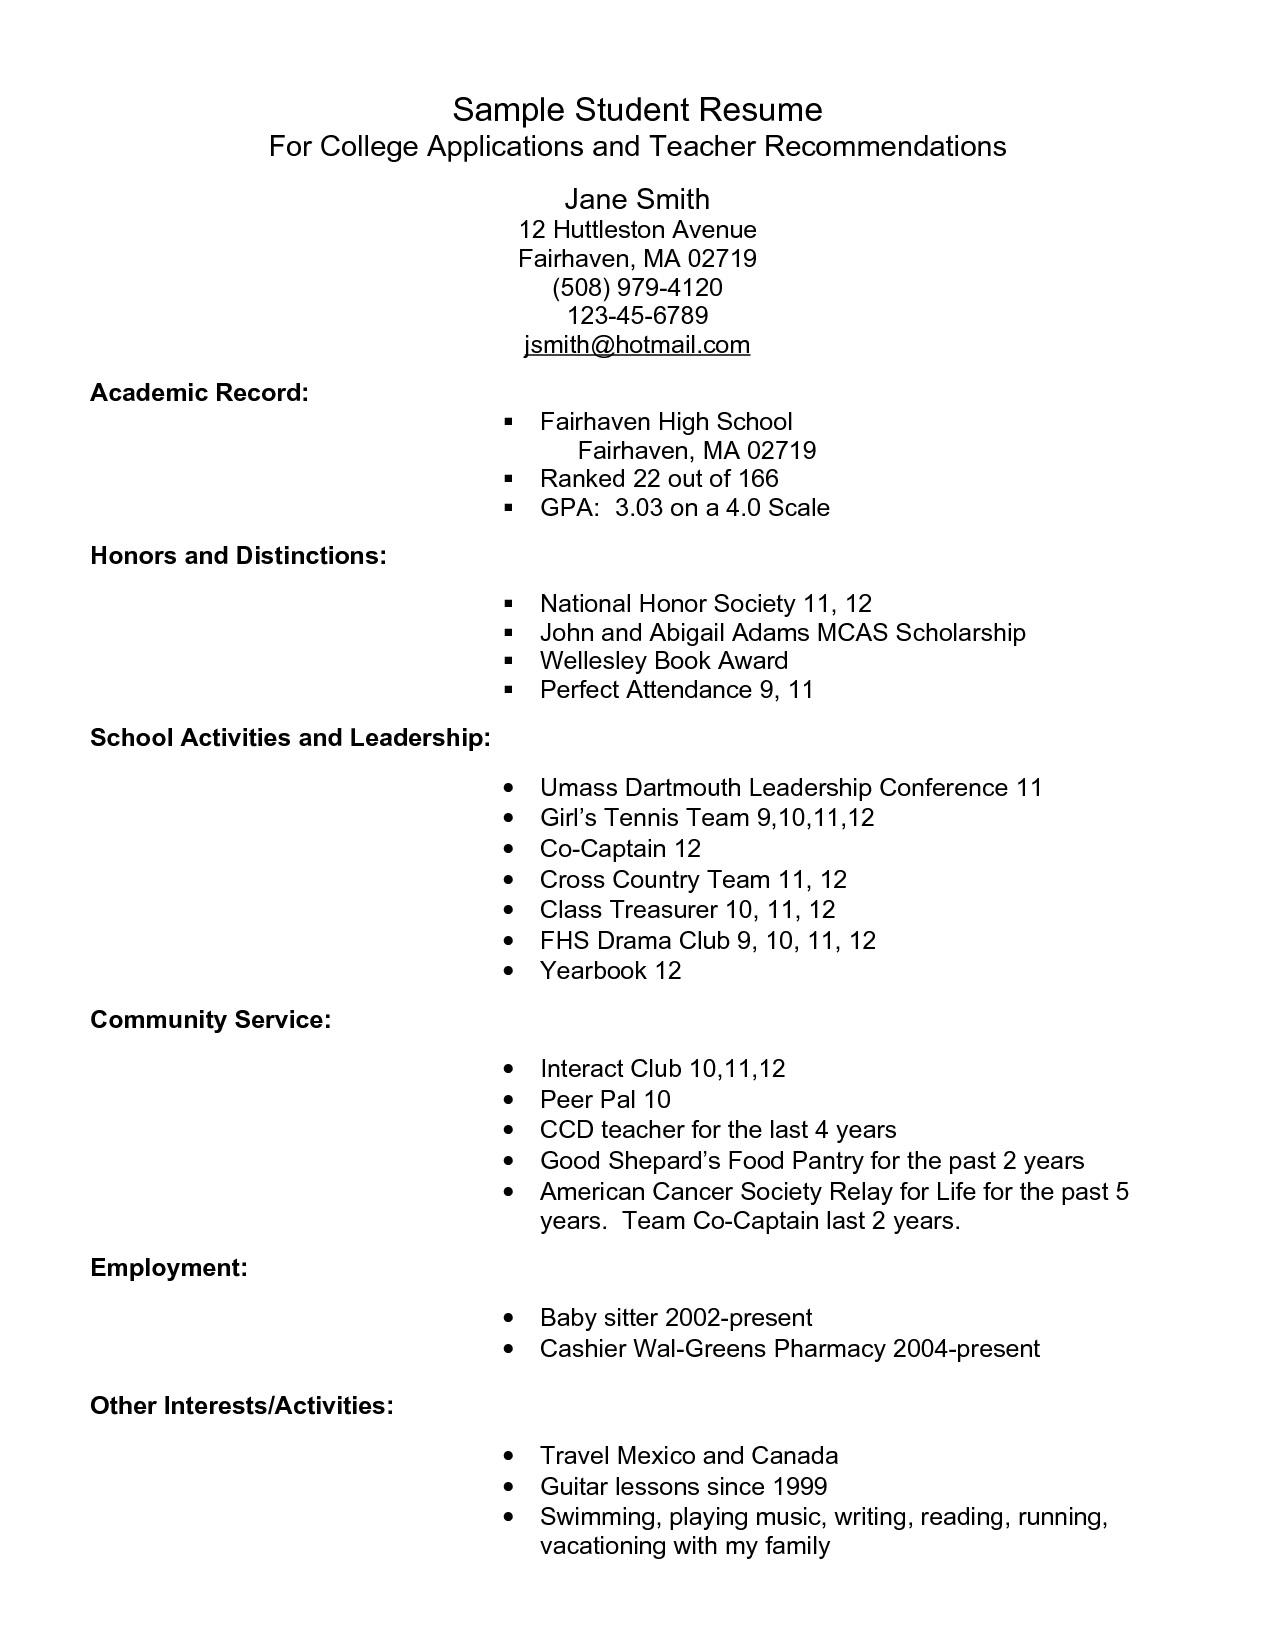 004 Impressive College Admission Resume Template Photo  Templates App Sample Application Microsoft WordFull